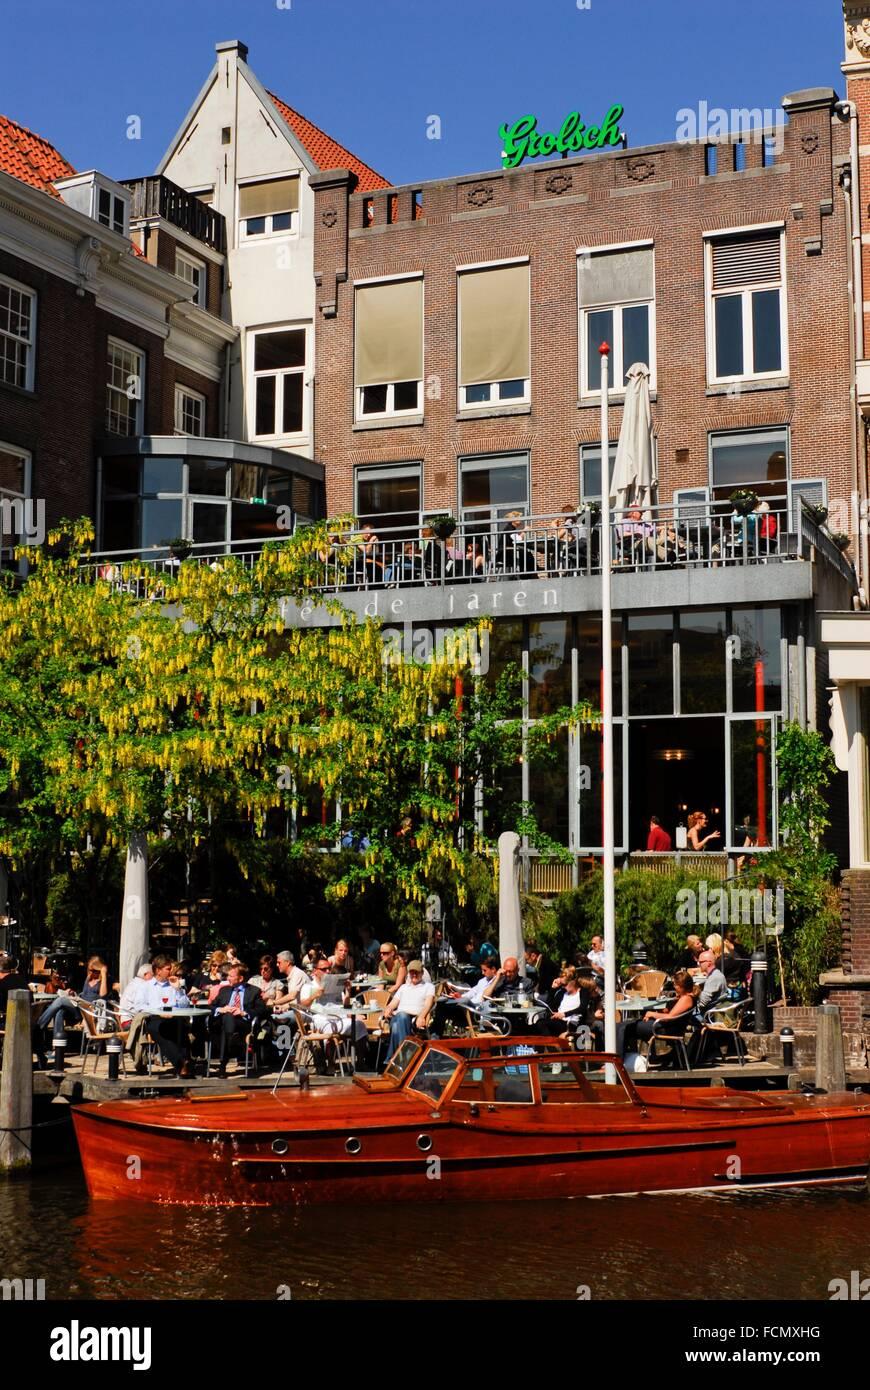 Cafe de Jaren Terrace besides NH Doelen, Amsterdam, Netherlands, Europe. - Stock Image